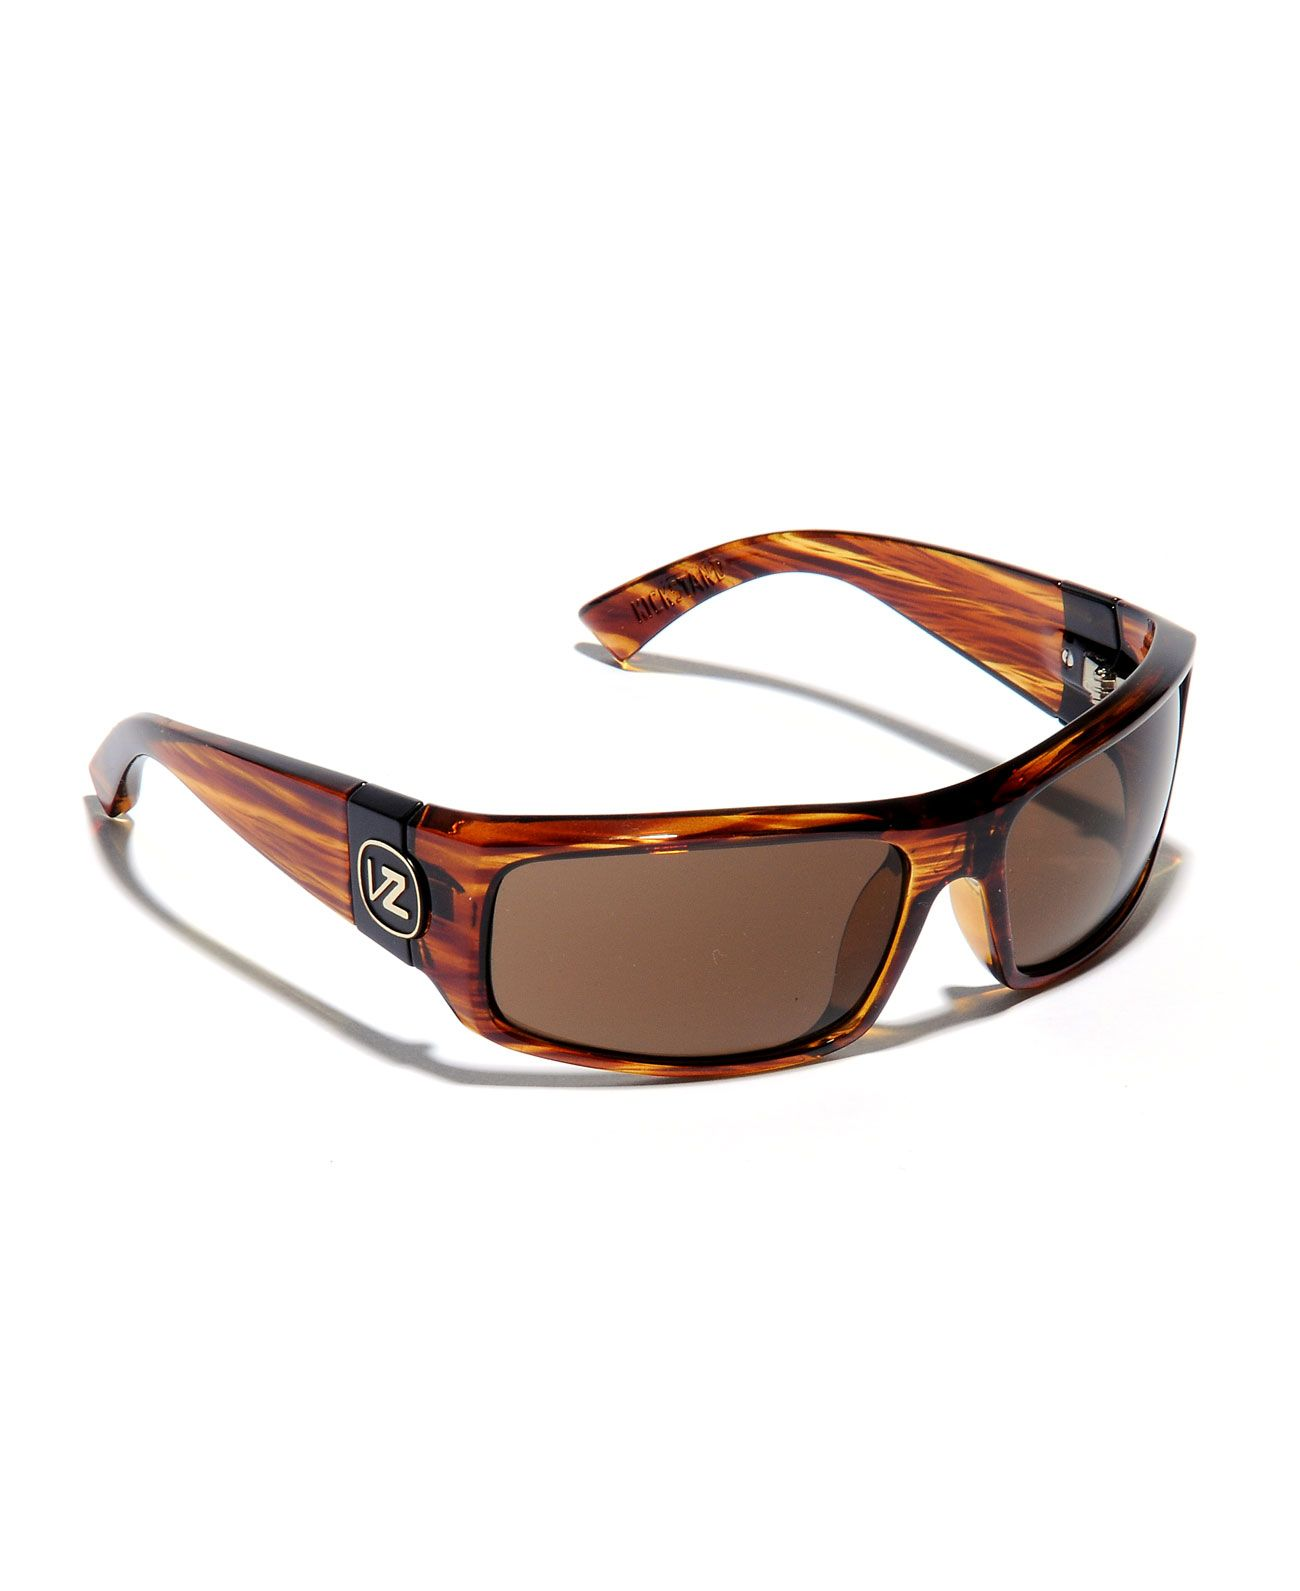 1fe743ca43 Von Zipper Kickstand Tortoise Sunglasses from South Moon Under ...